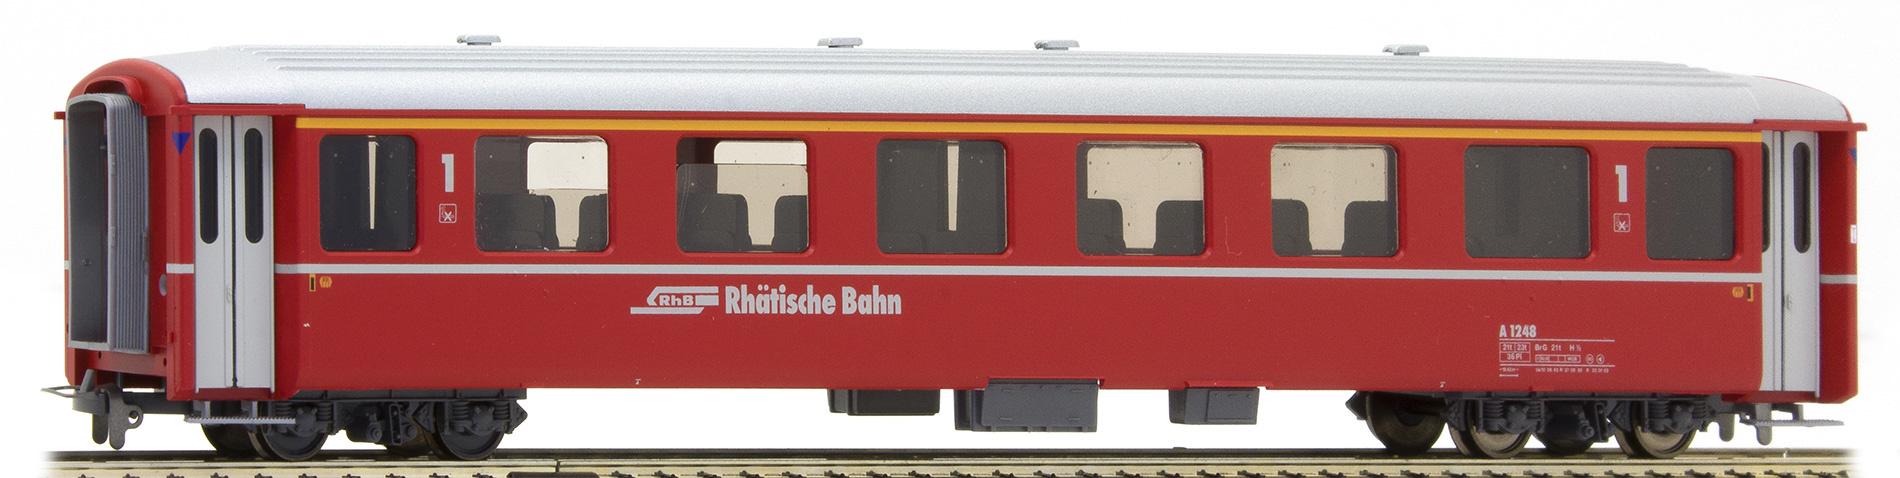 3252158 RhB A 1248 Einheitswagen I-1